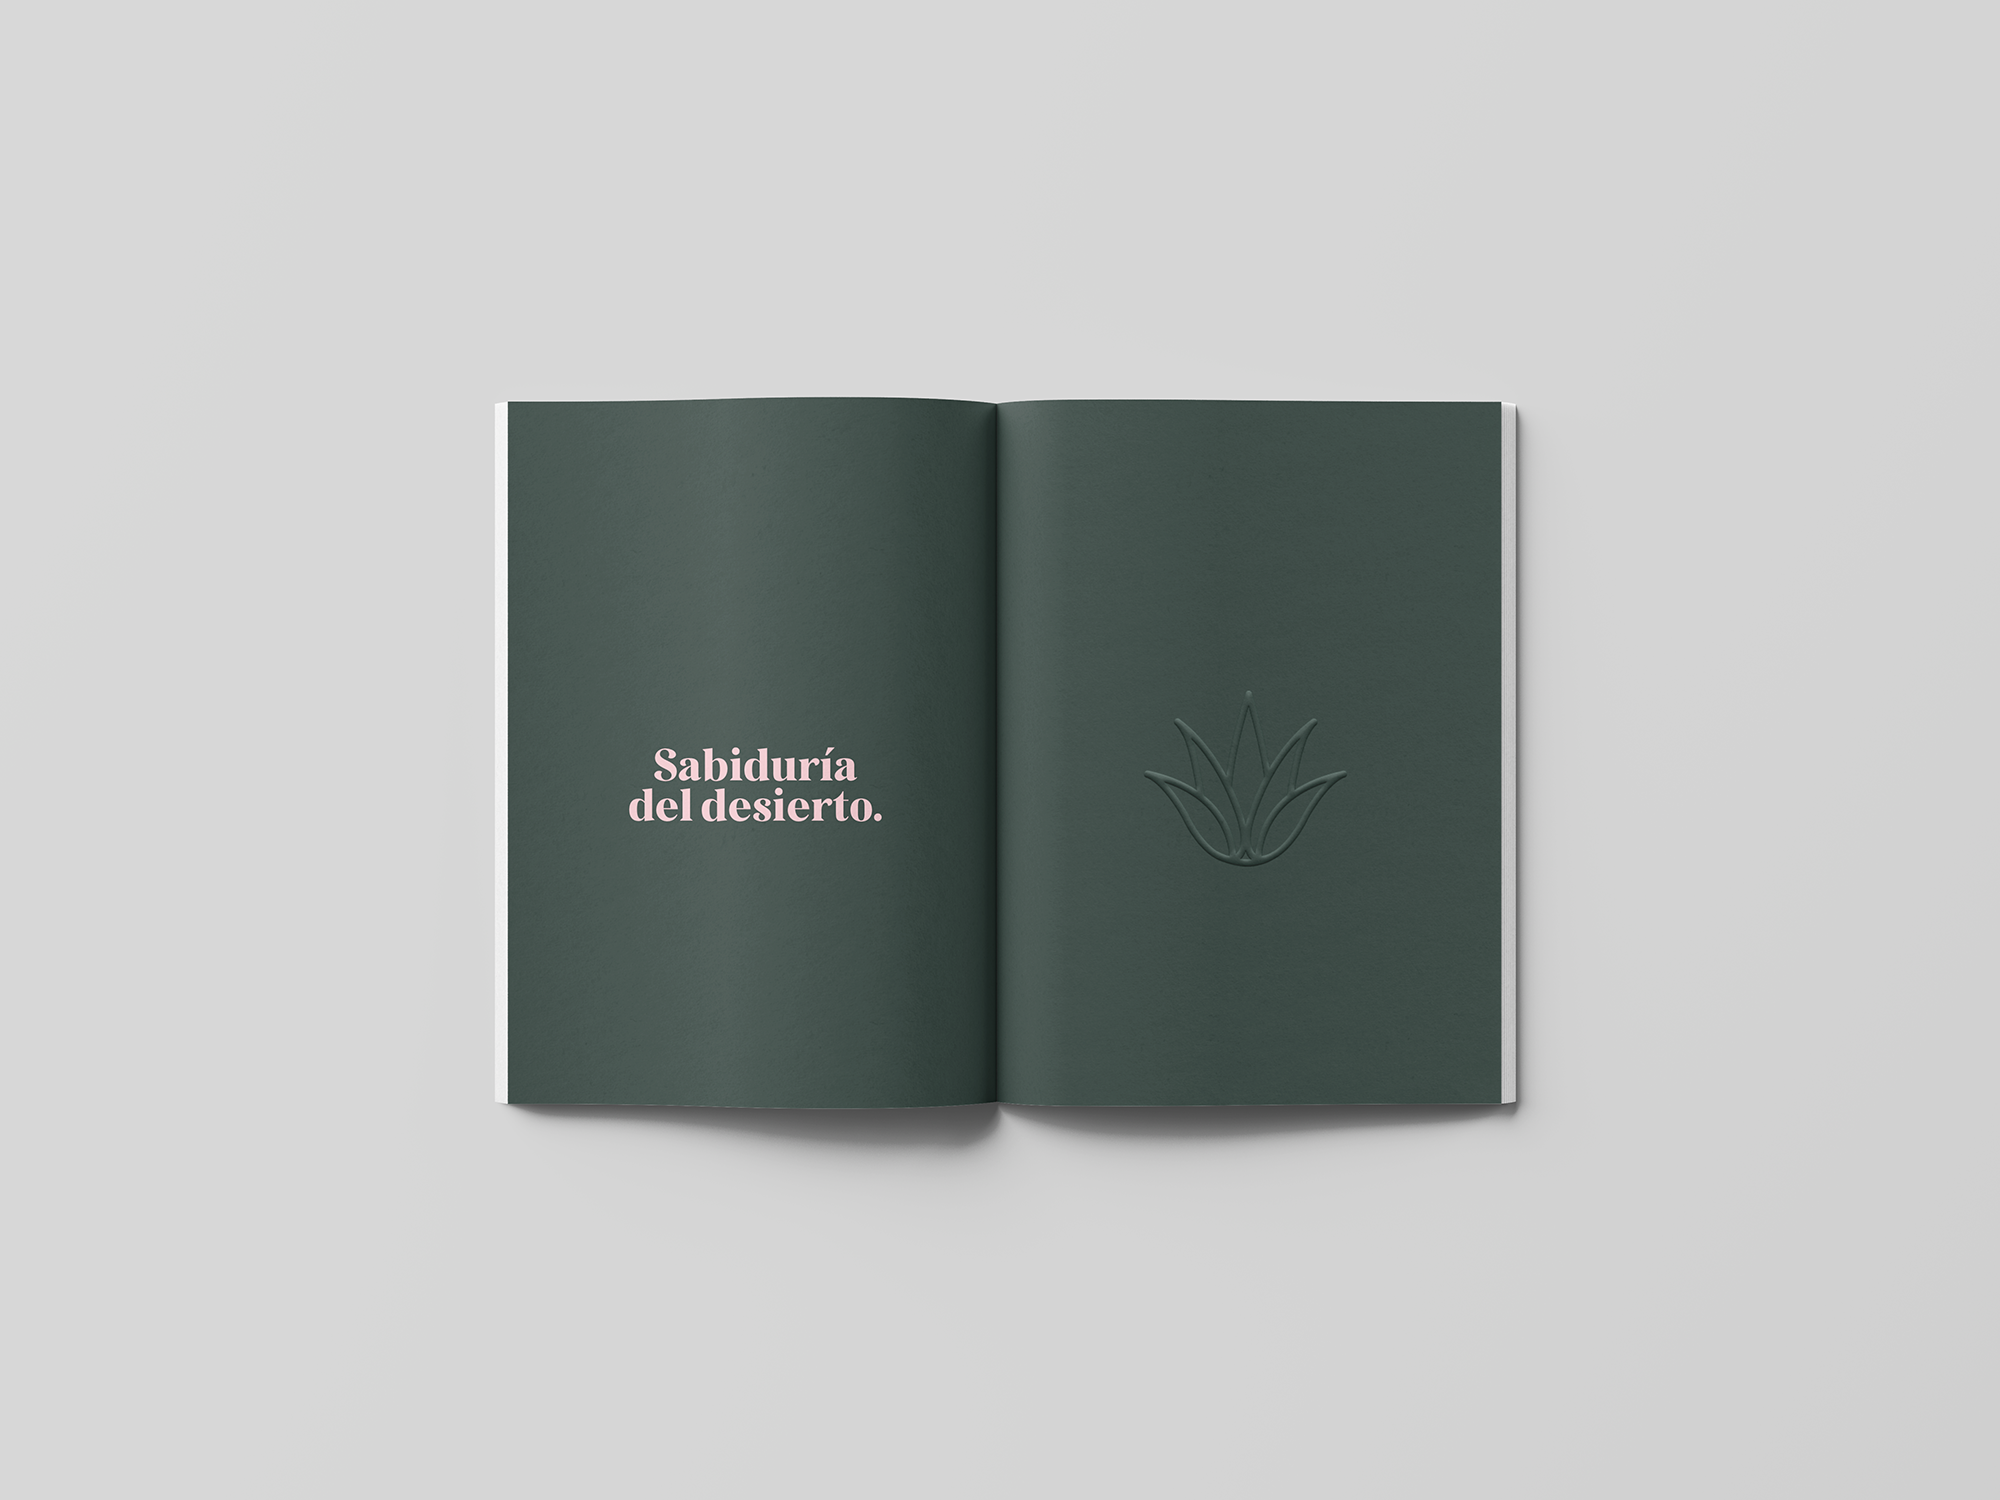 spread-05-book-agave-yoenpaperland